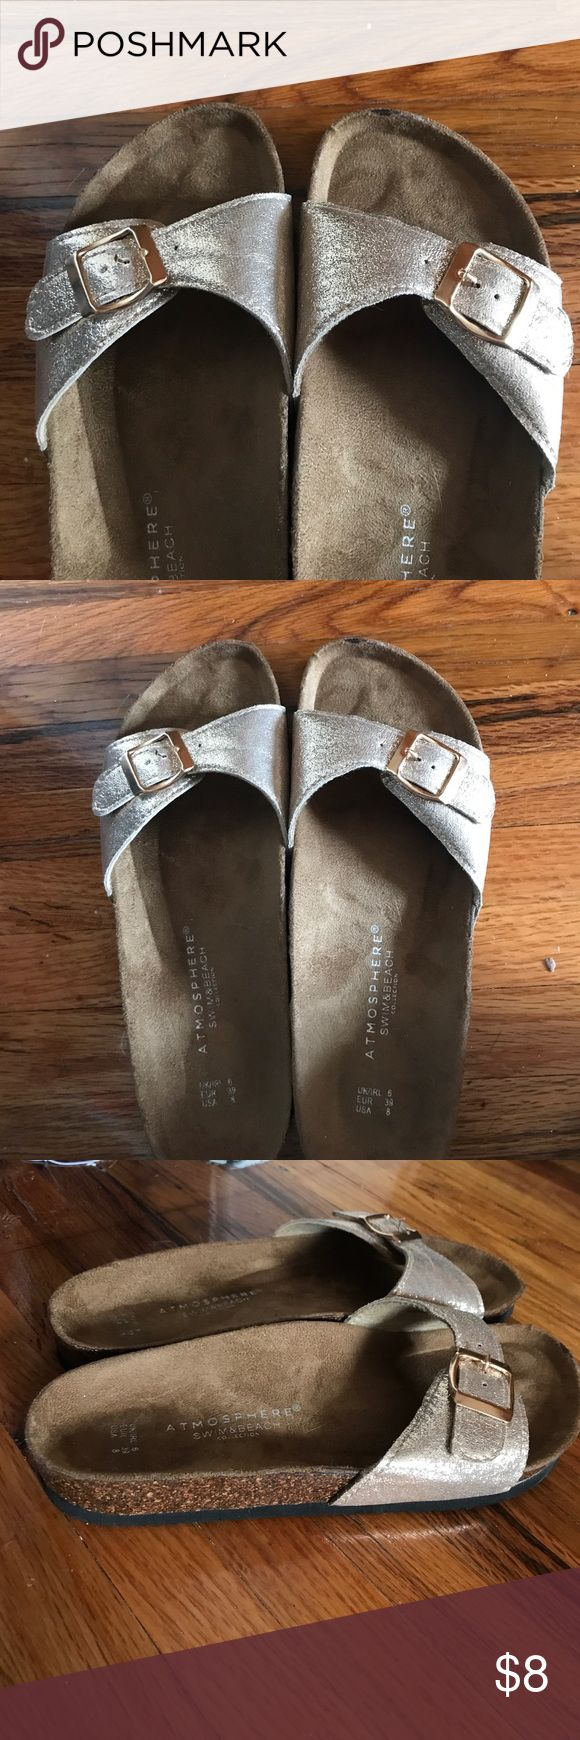 Primark sandals Gold metallic sandals very comfortable! primark Shoes Platforms